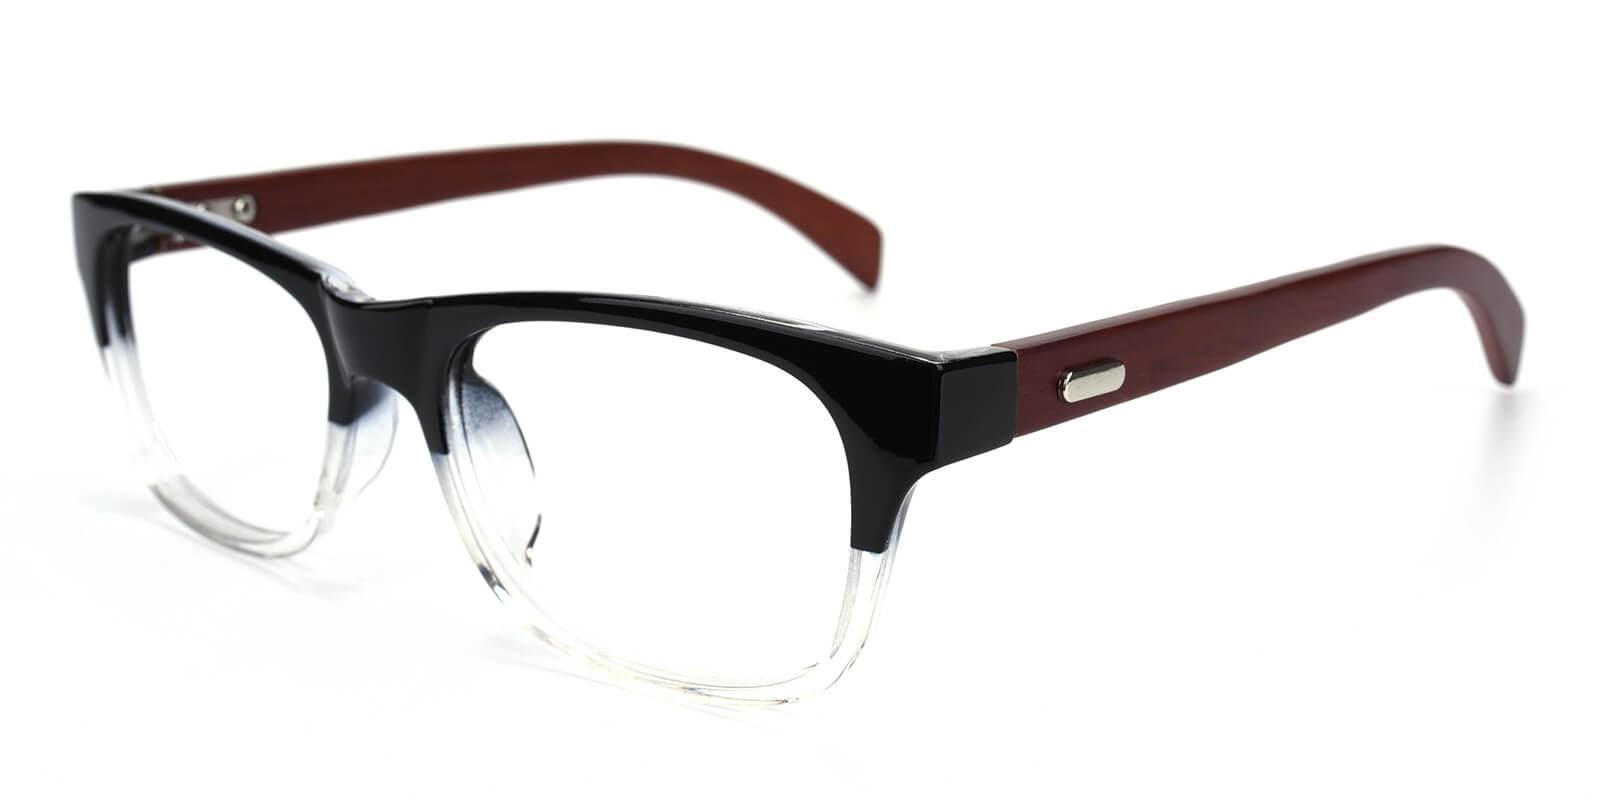 Intense-Multicolor-Square-Acetate-Eyeglasses-additional1